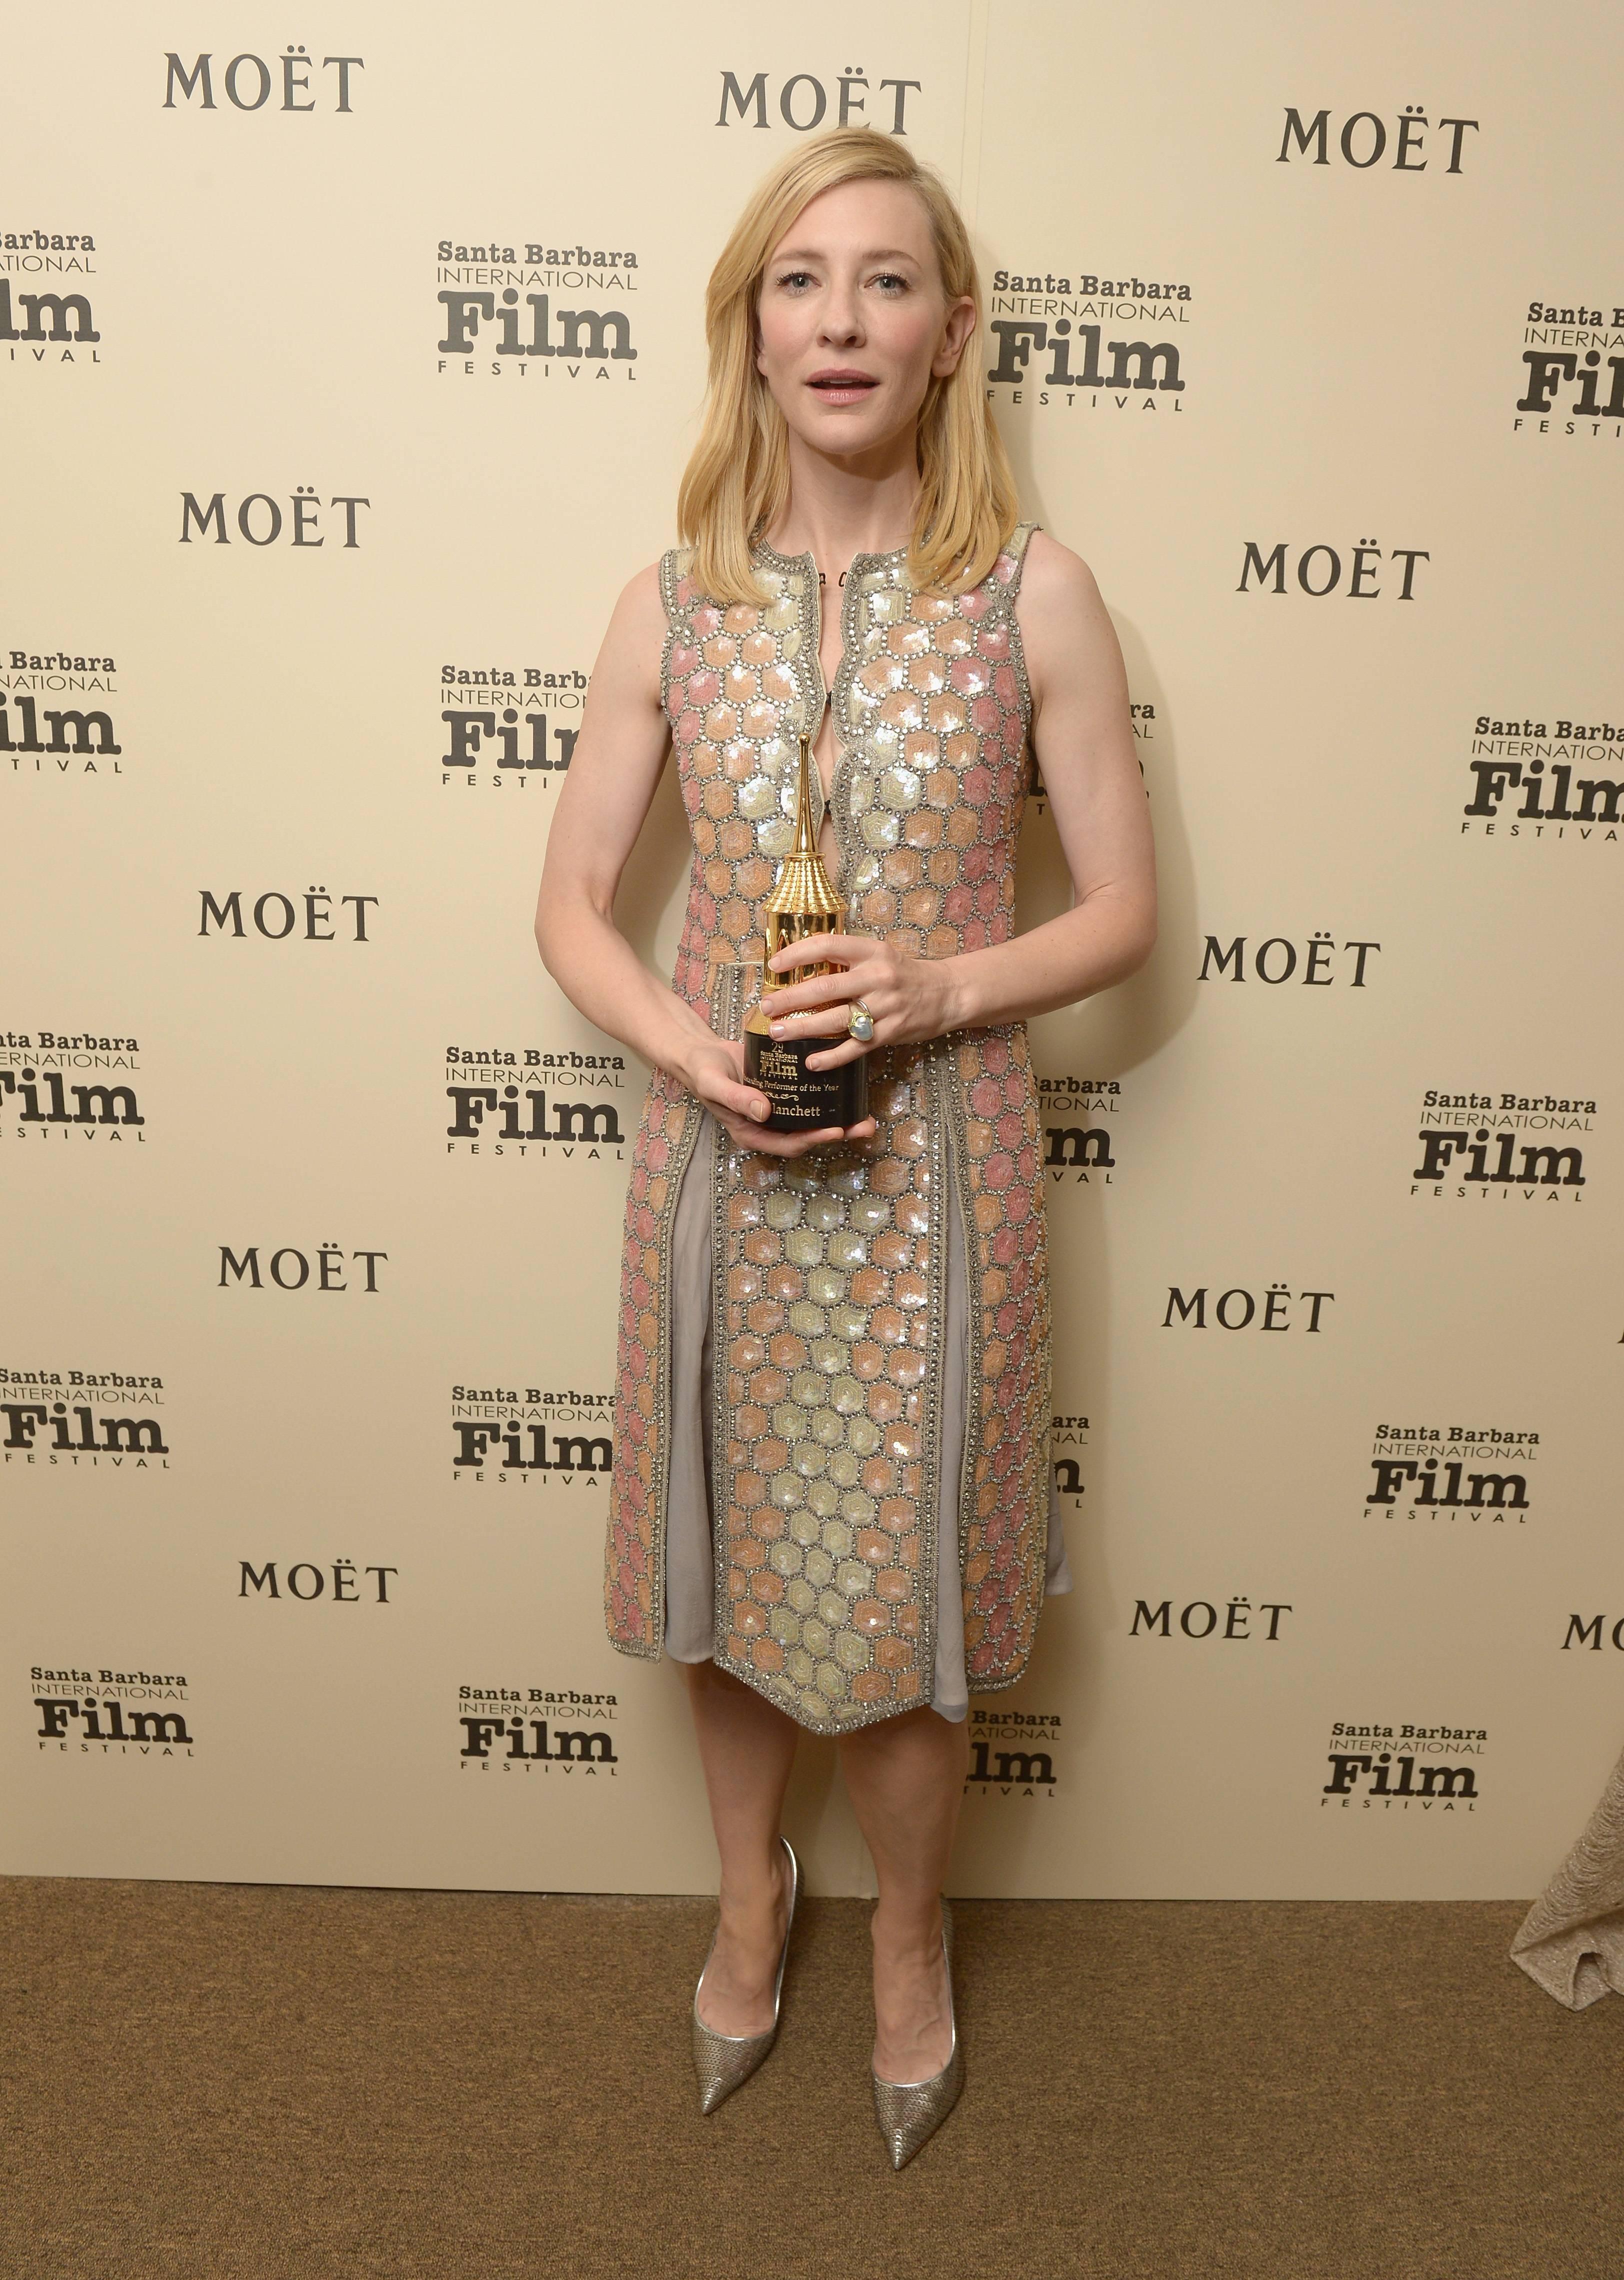 The Moet & Chandon Lounge at The 2014 Santa Barbara International Film Festival -  Honoring Cate Blanchett